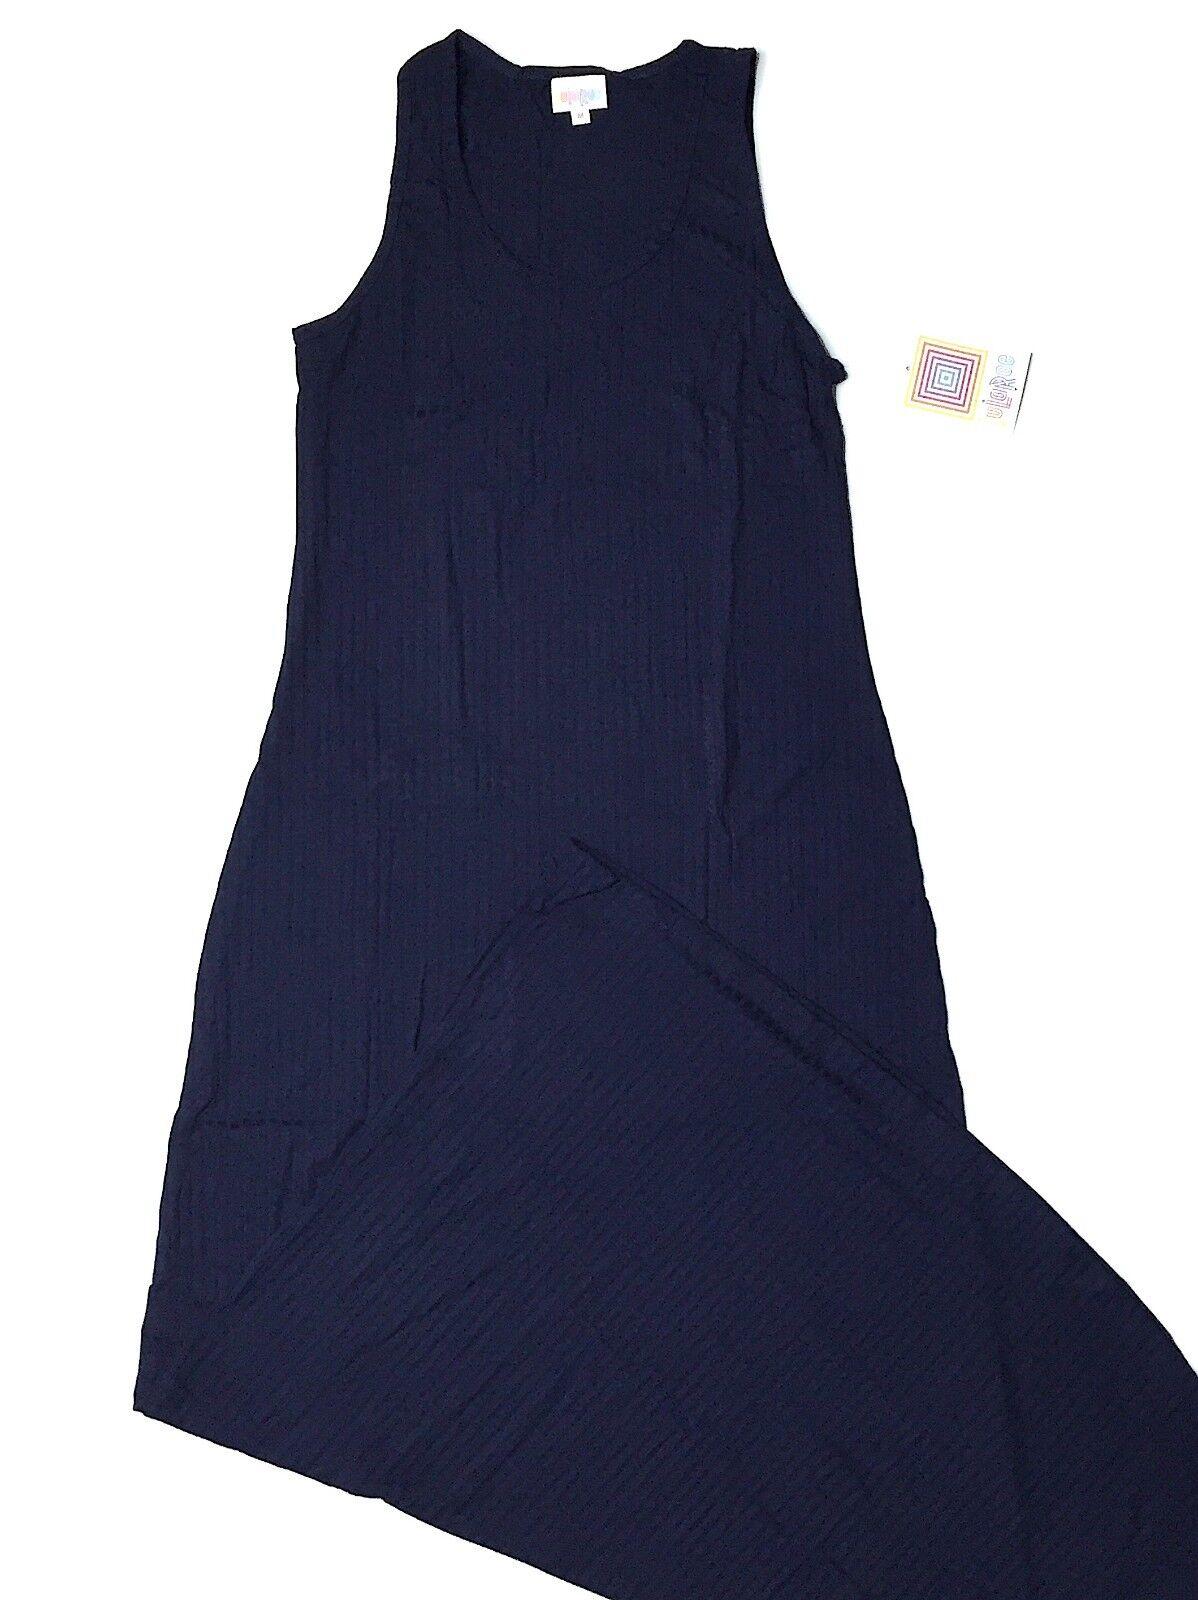 LuLaRoe DANI Dress  Medium Tank Maxi  Solid Navy bluee Ribbed w  Great Stretch